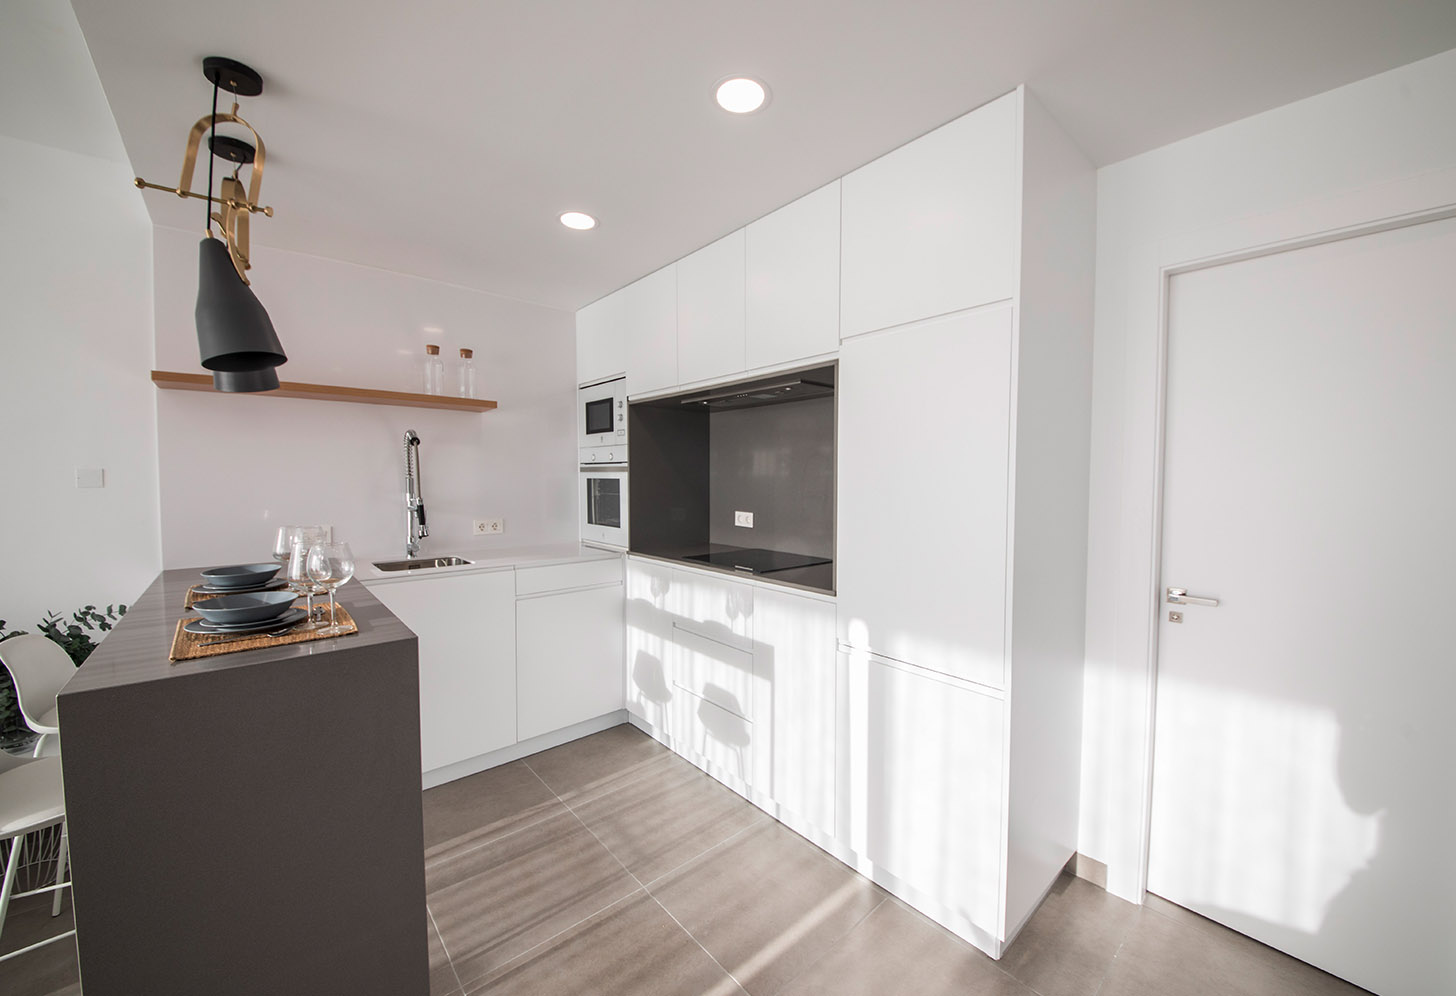 immobilier neuf espagne costa blanca sur murcia cuisine